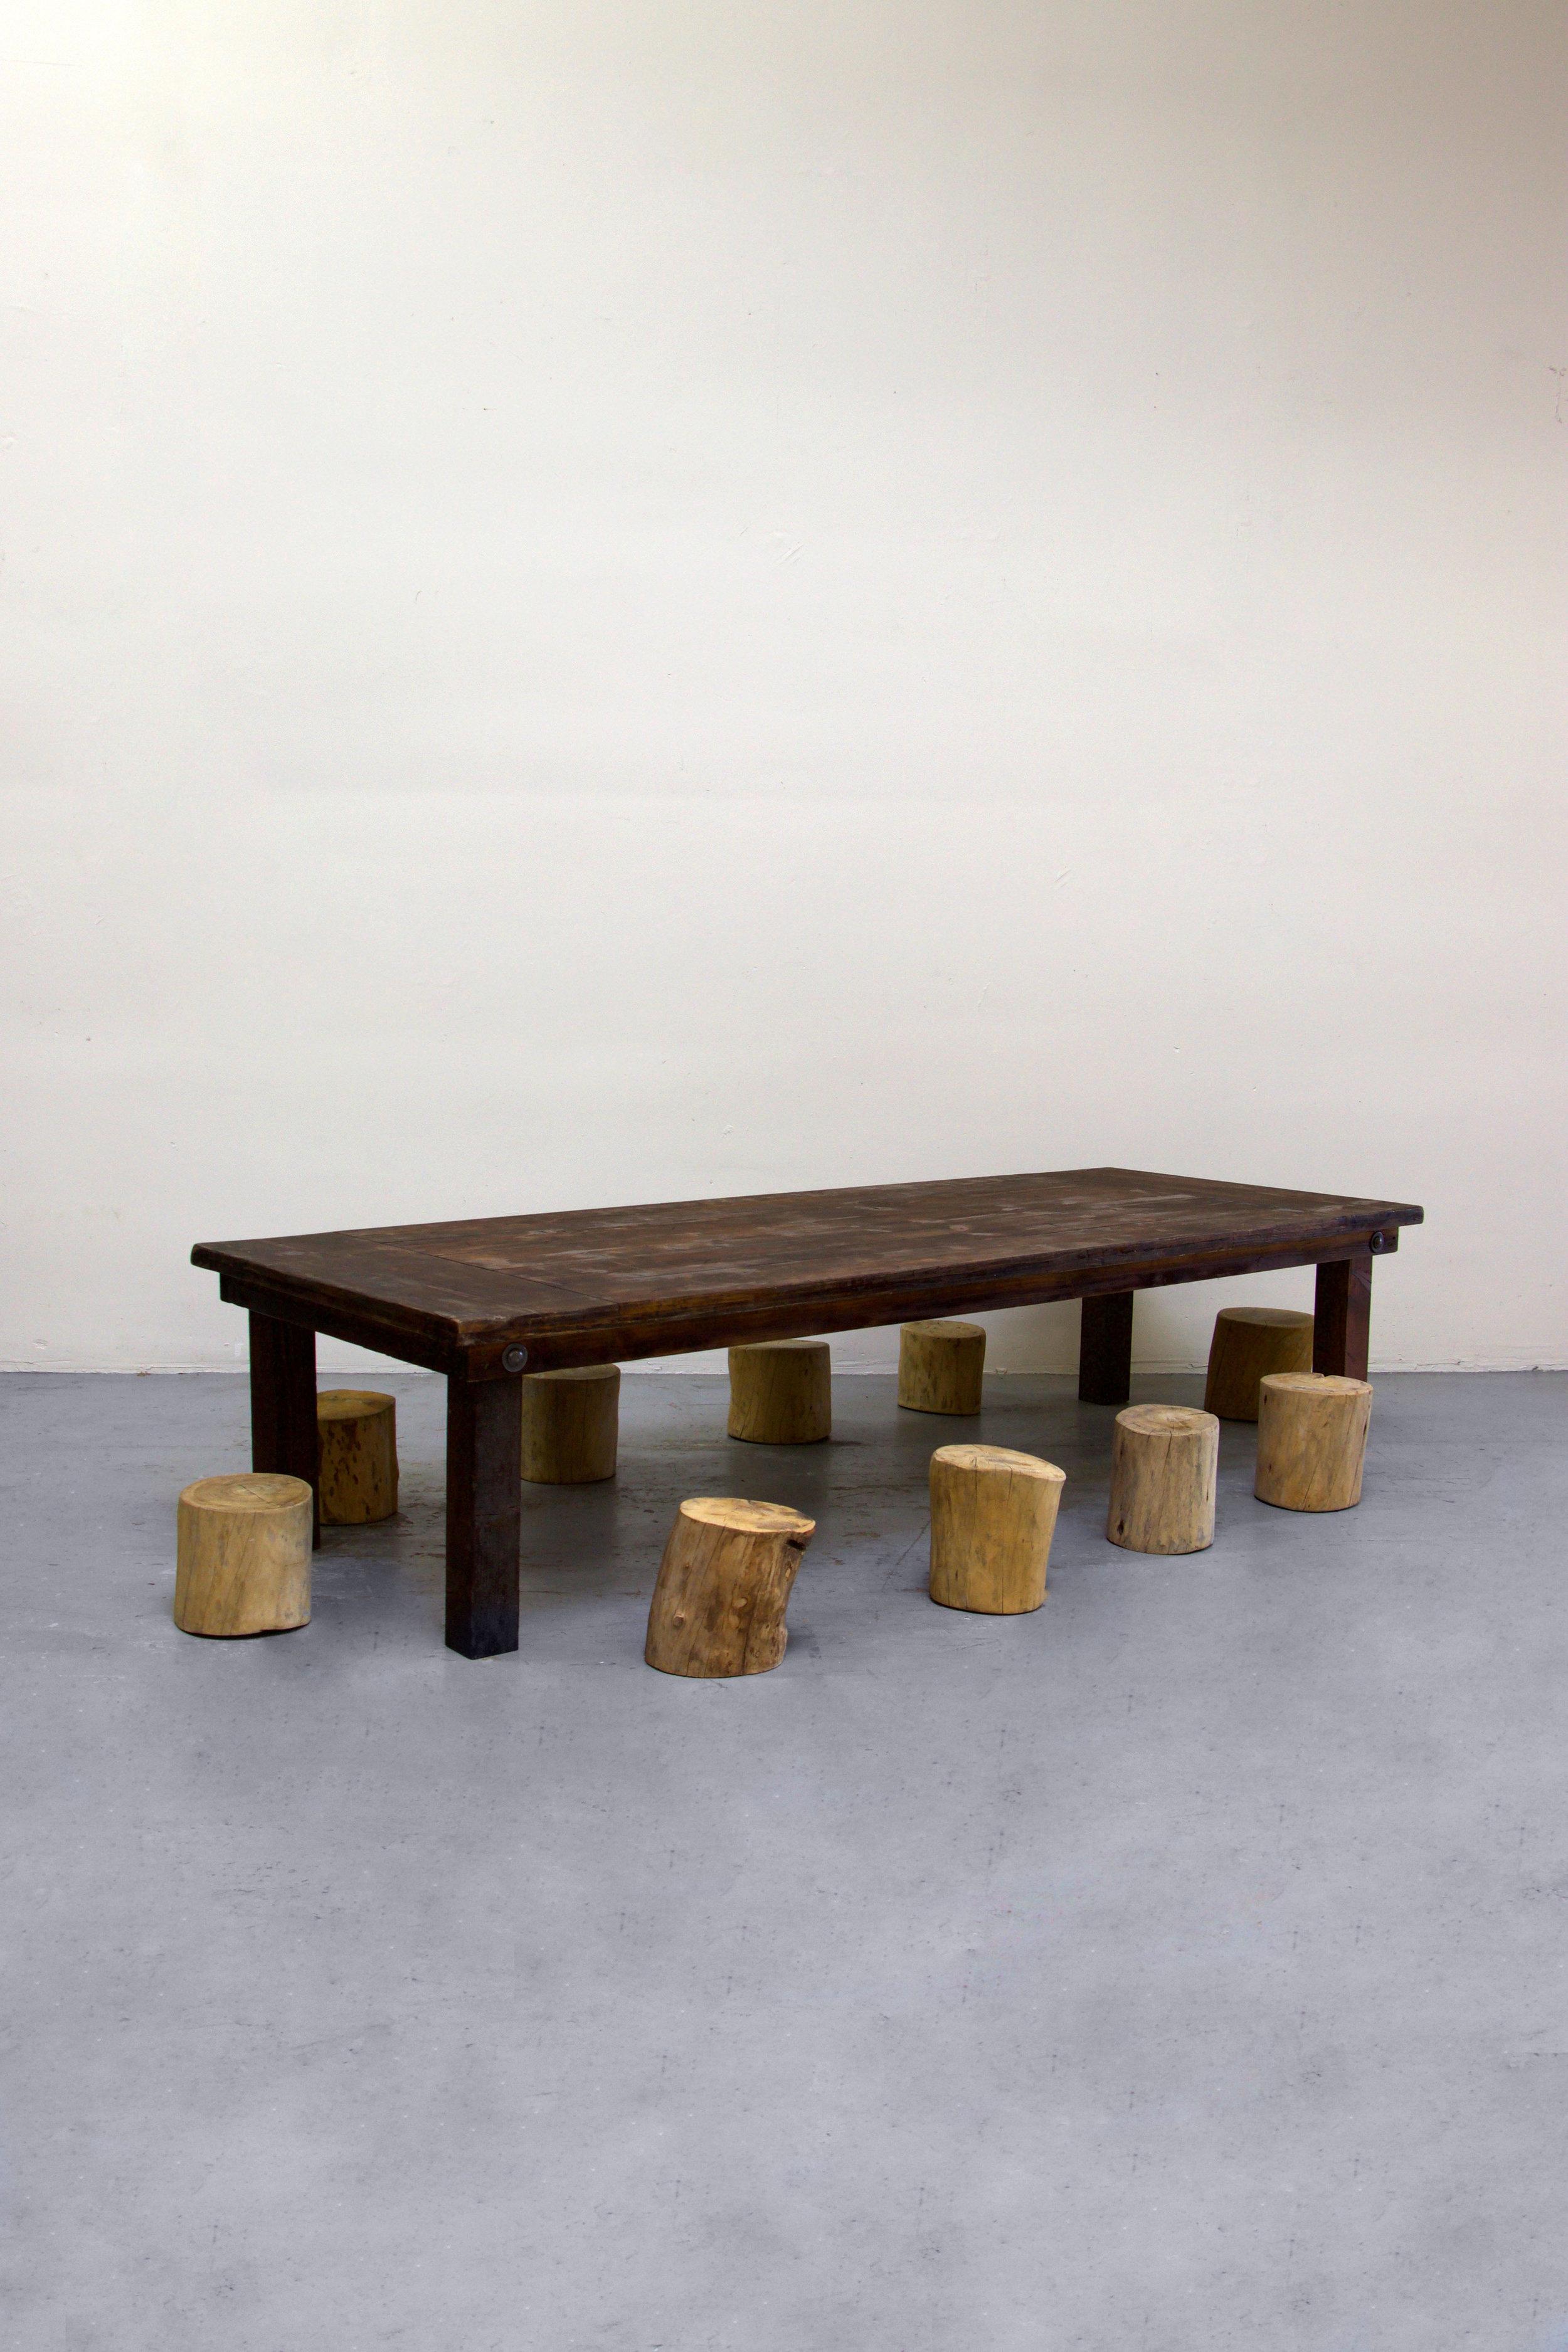 1 Kids Mahogany Farm Table w/ 10 Tree Stumps